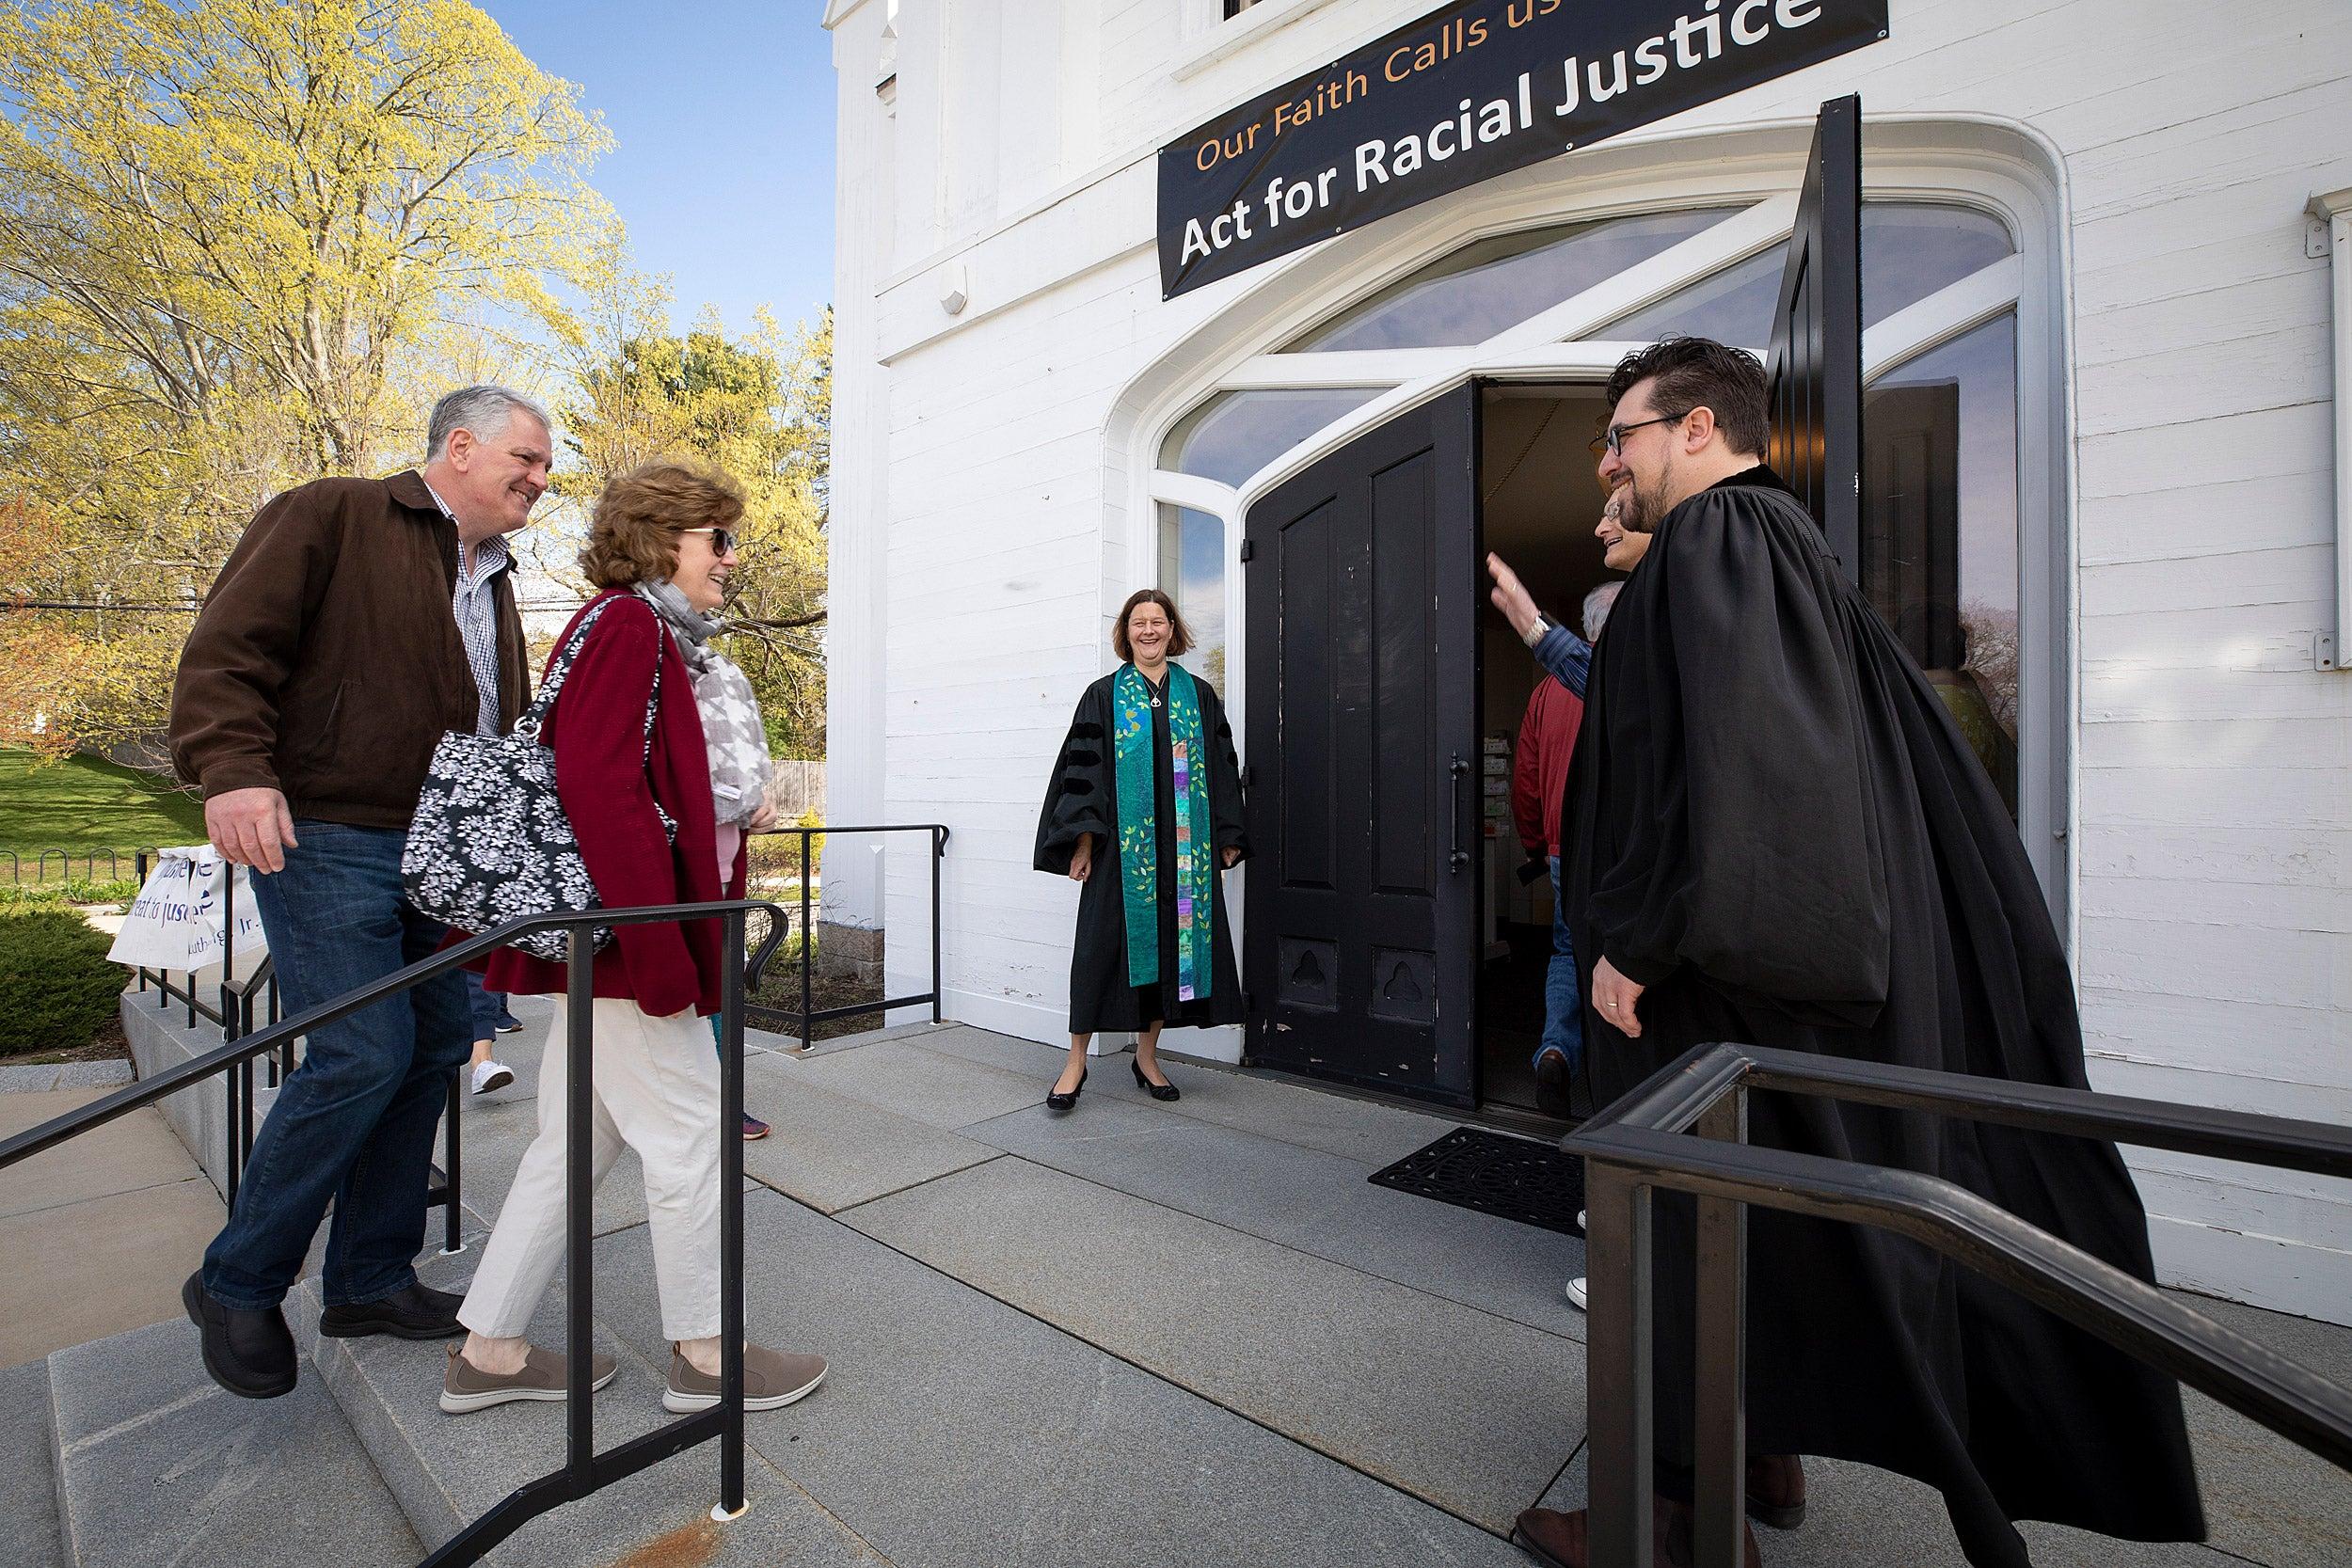 Israel Buffardi greets congregants entering church.